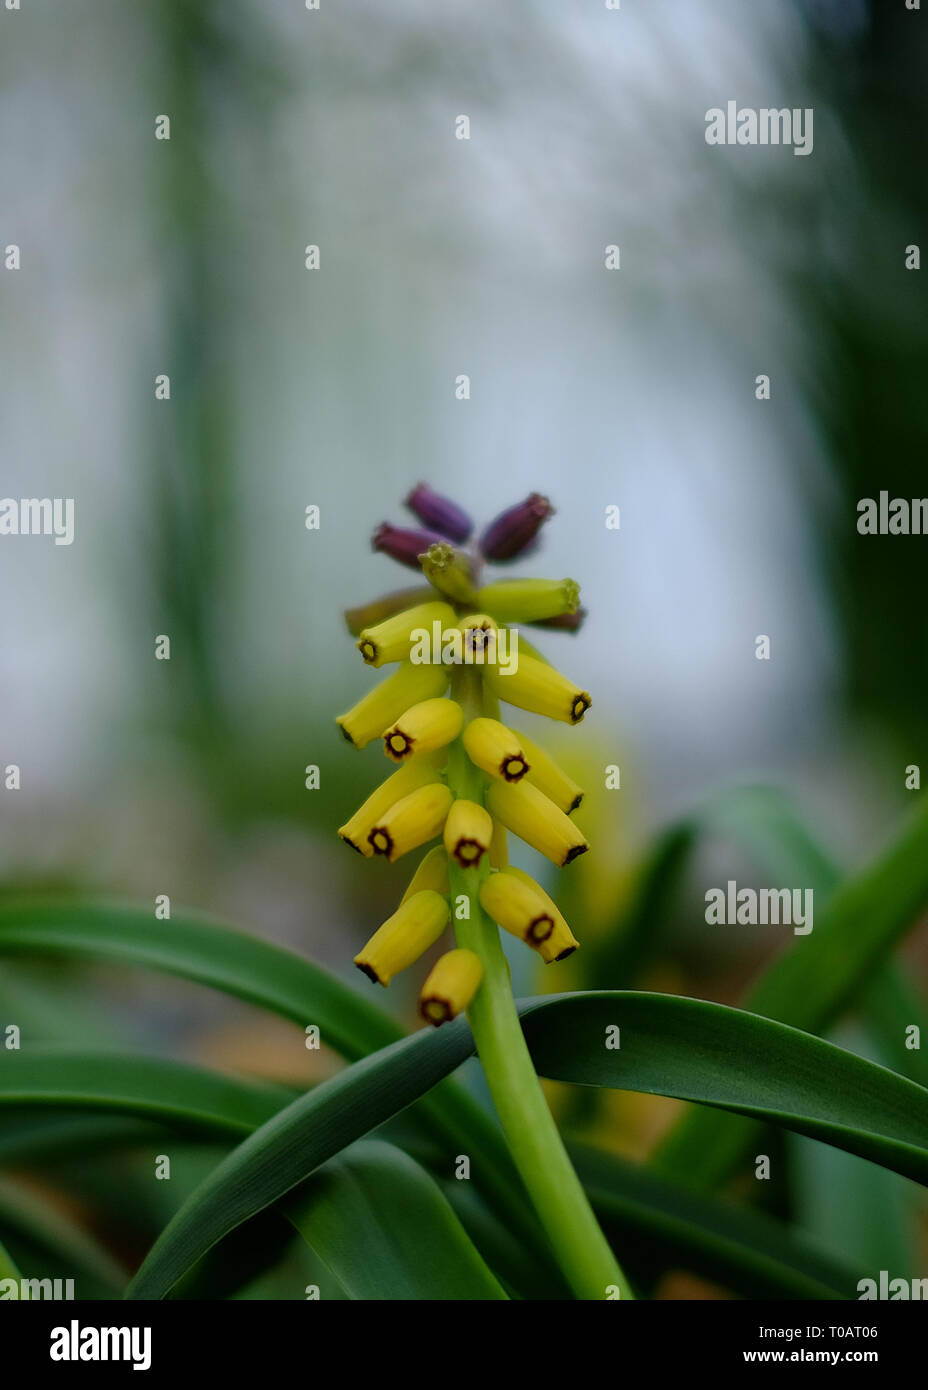 Yellow Grape Hyacinth Muscari macrocarpum flower in spring blurred background Stock Photo